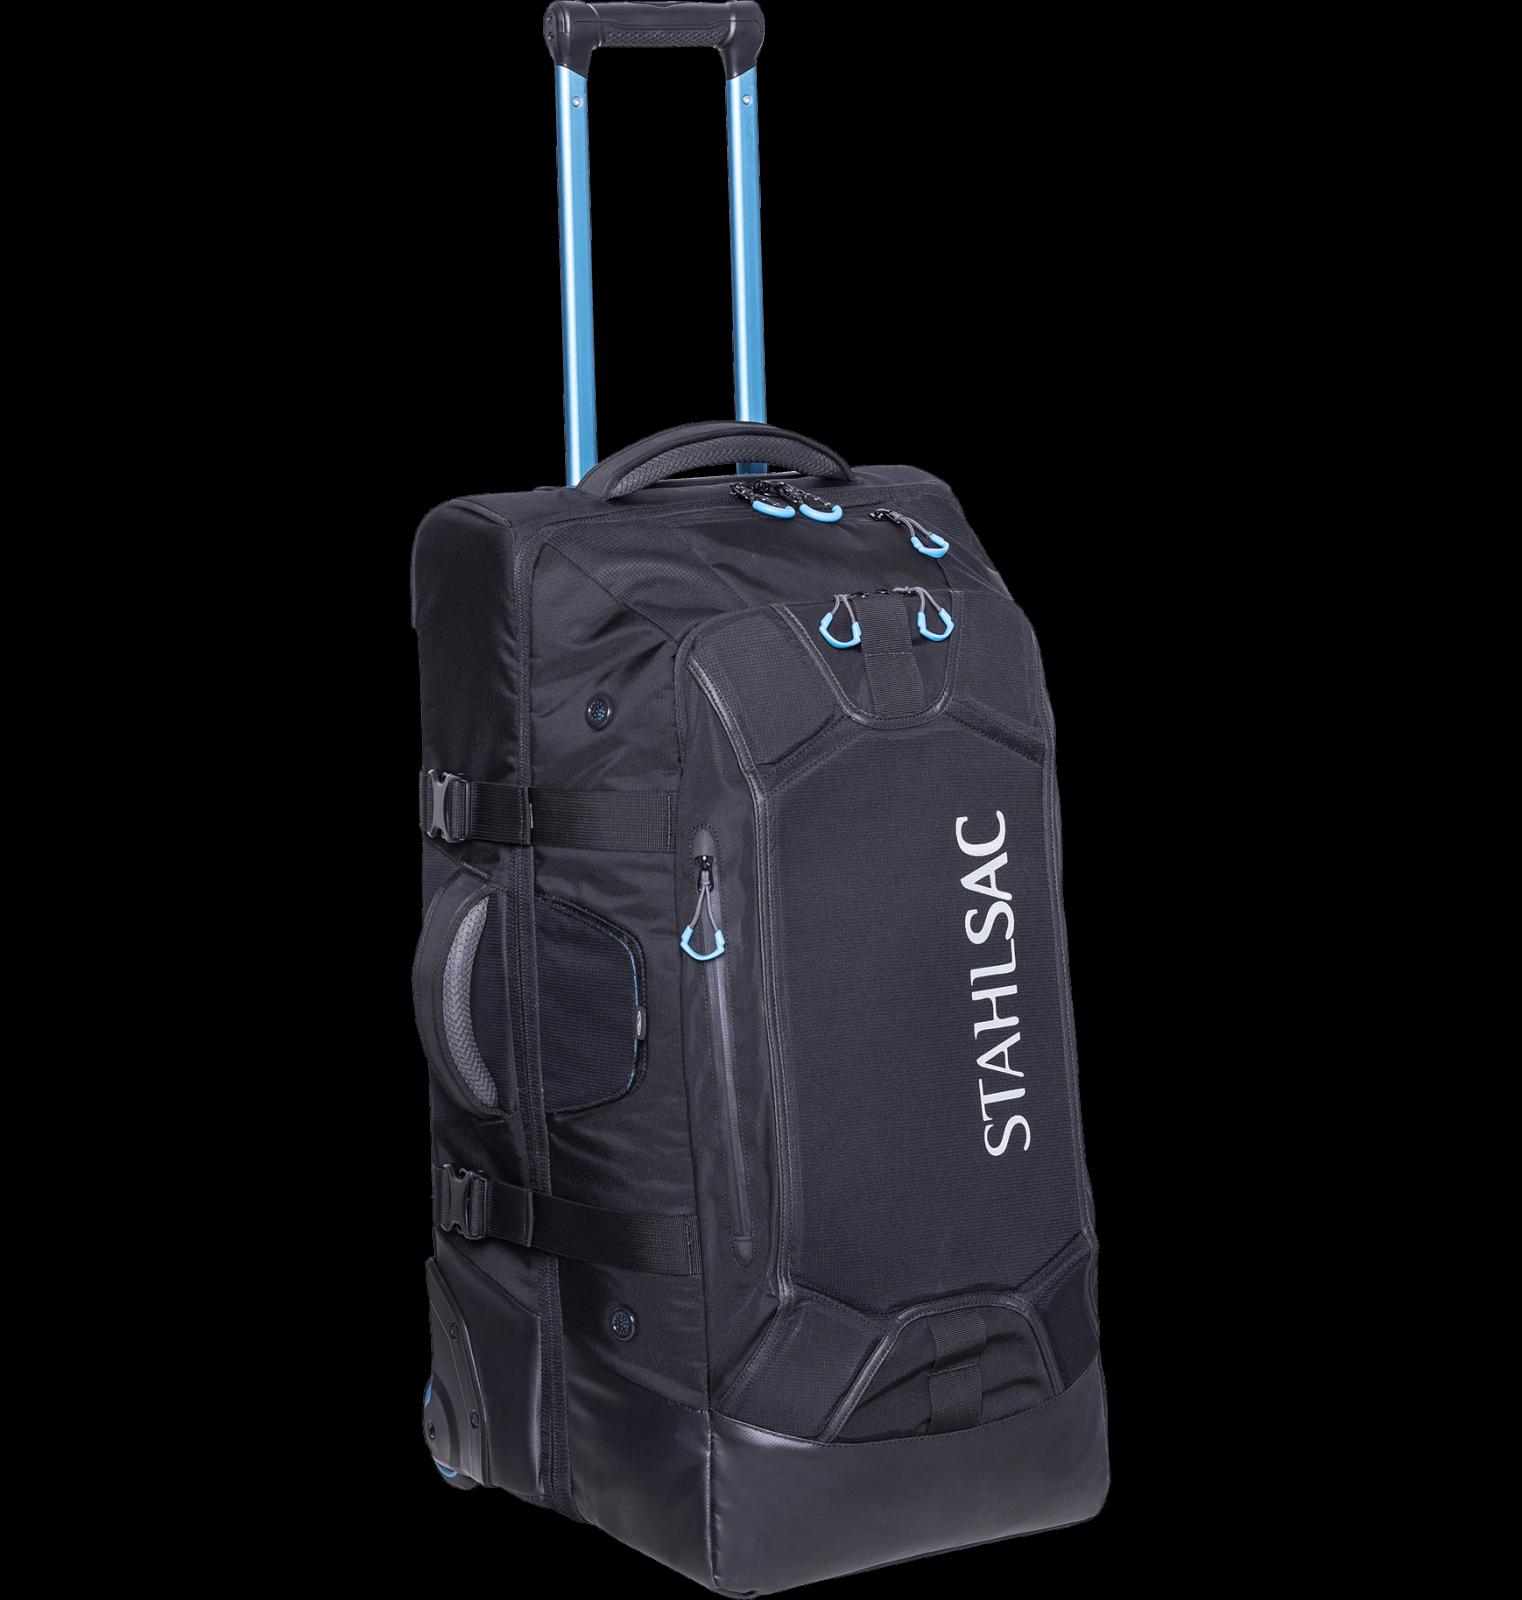 STAHLSAC Steel Wheeled Bag - 27